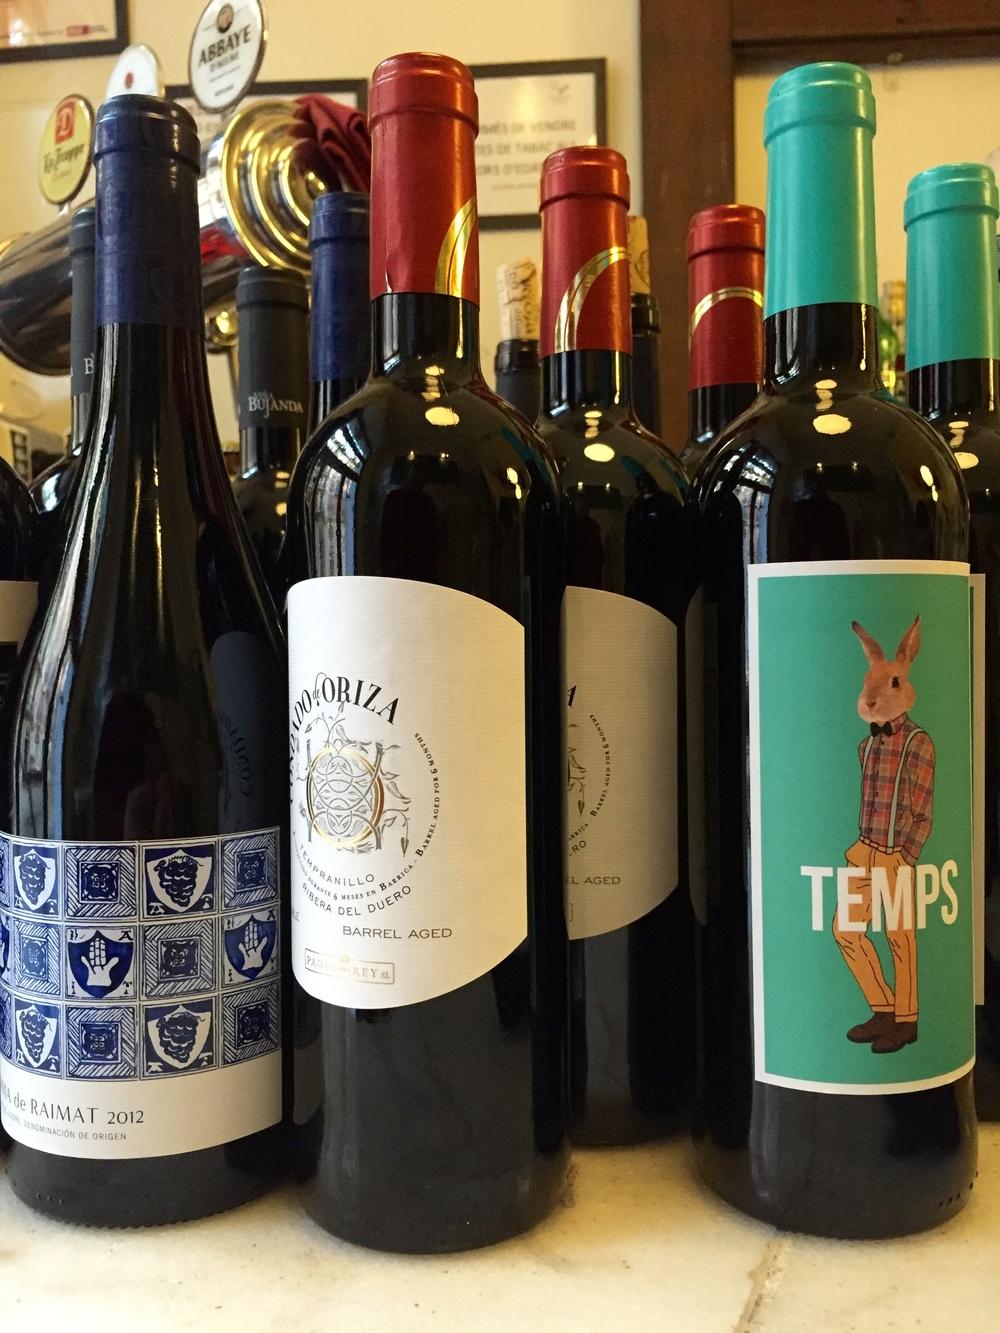 Wine bottles at El 58